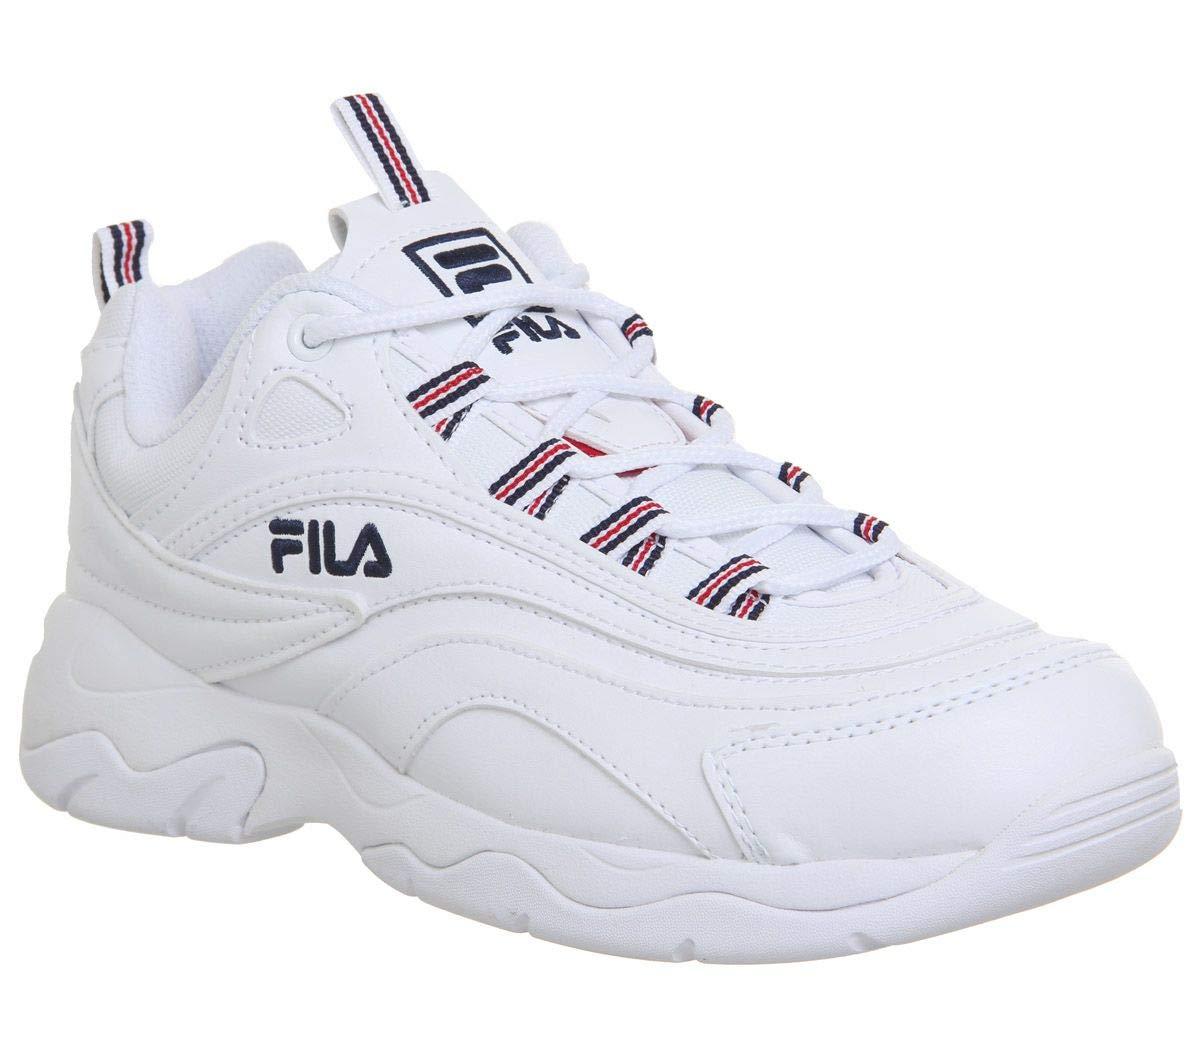 Fila Ray Damen Weiß/Marine/Rot Sneakers-UK 8 / EU 41